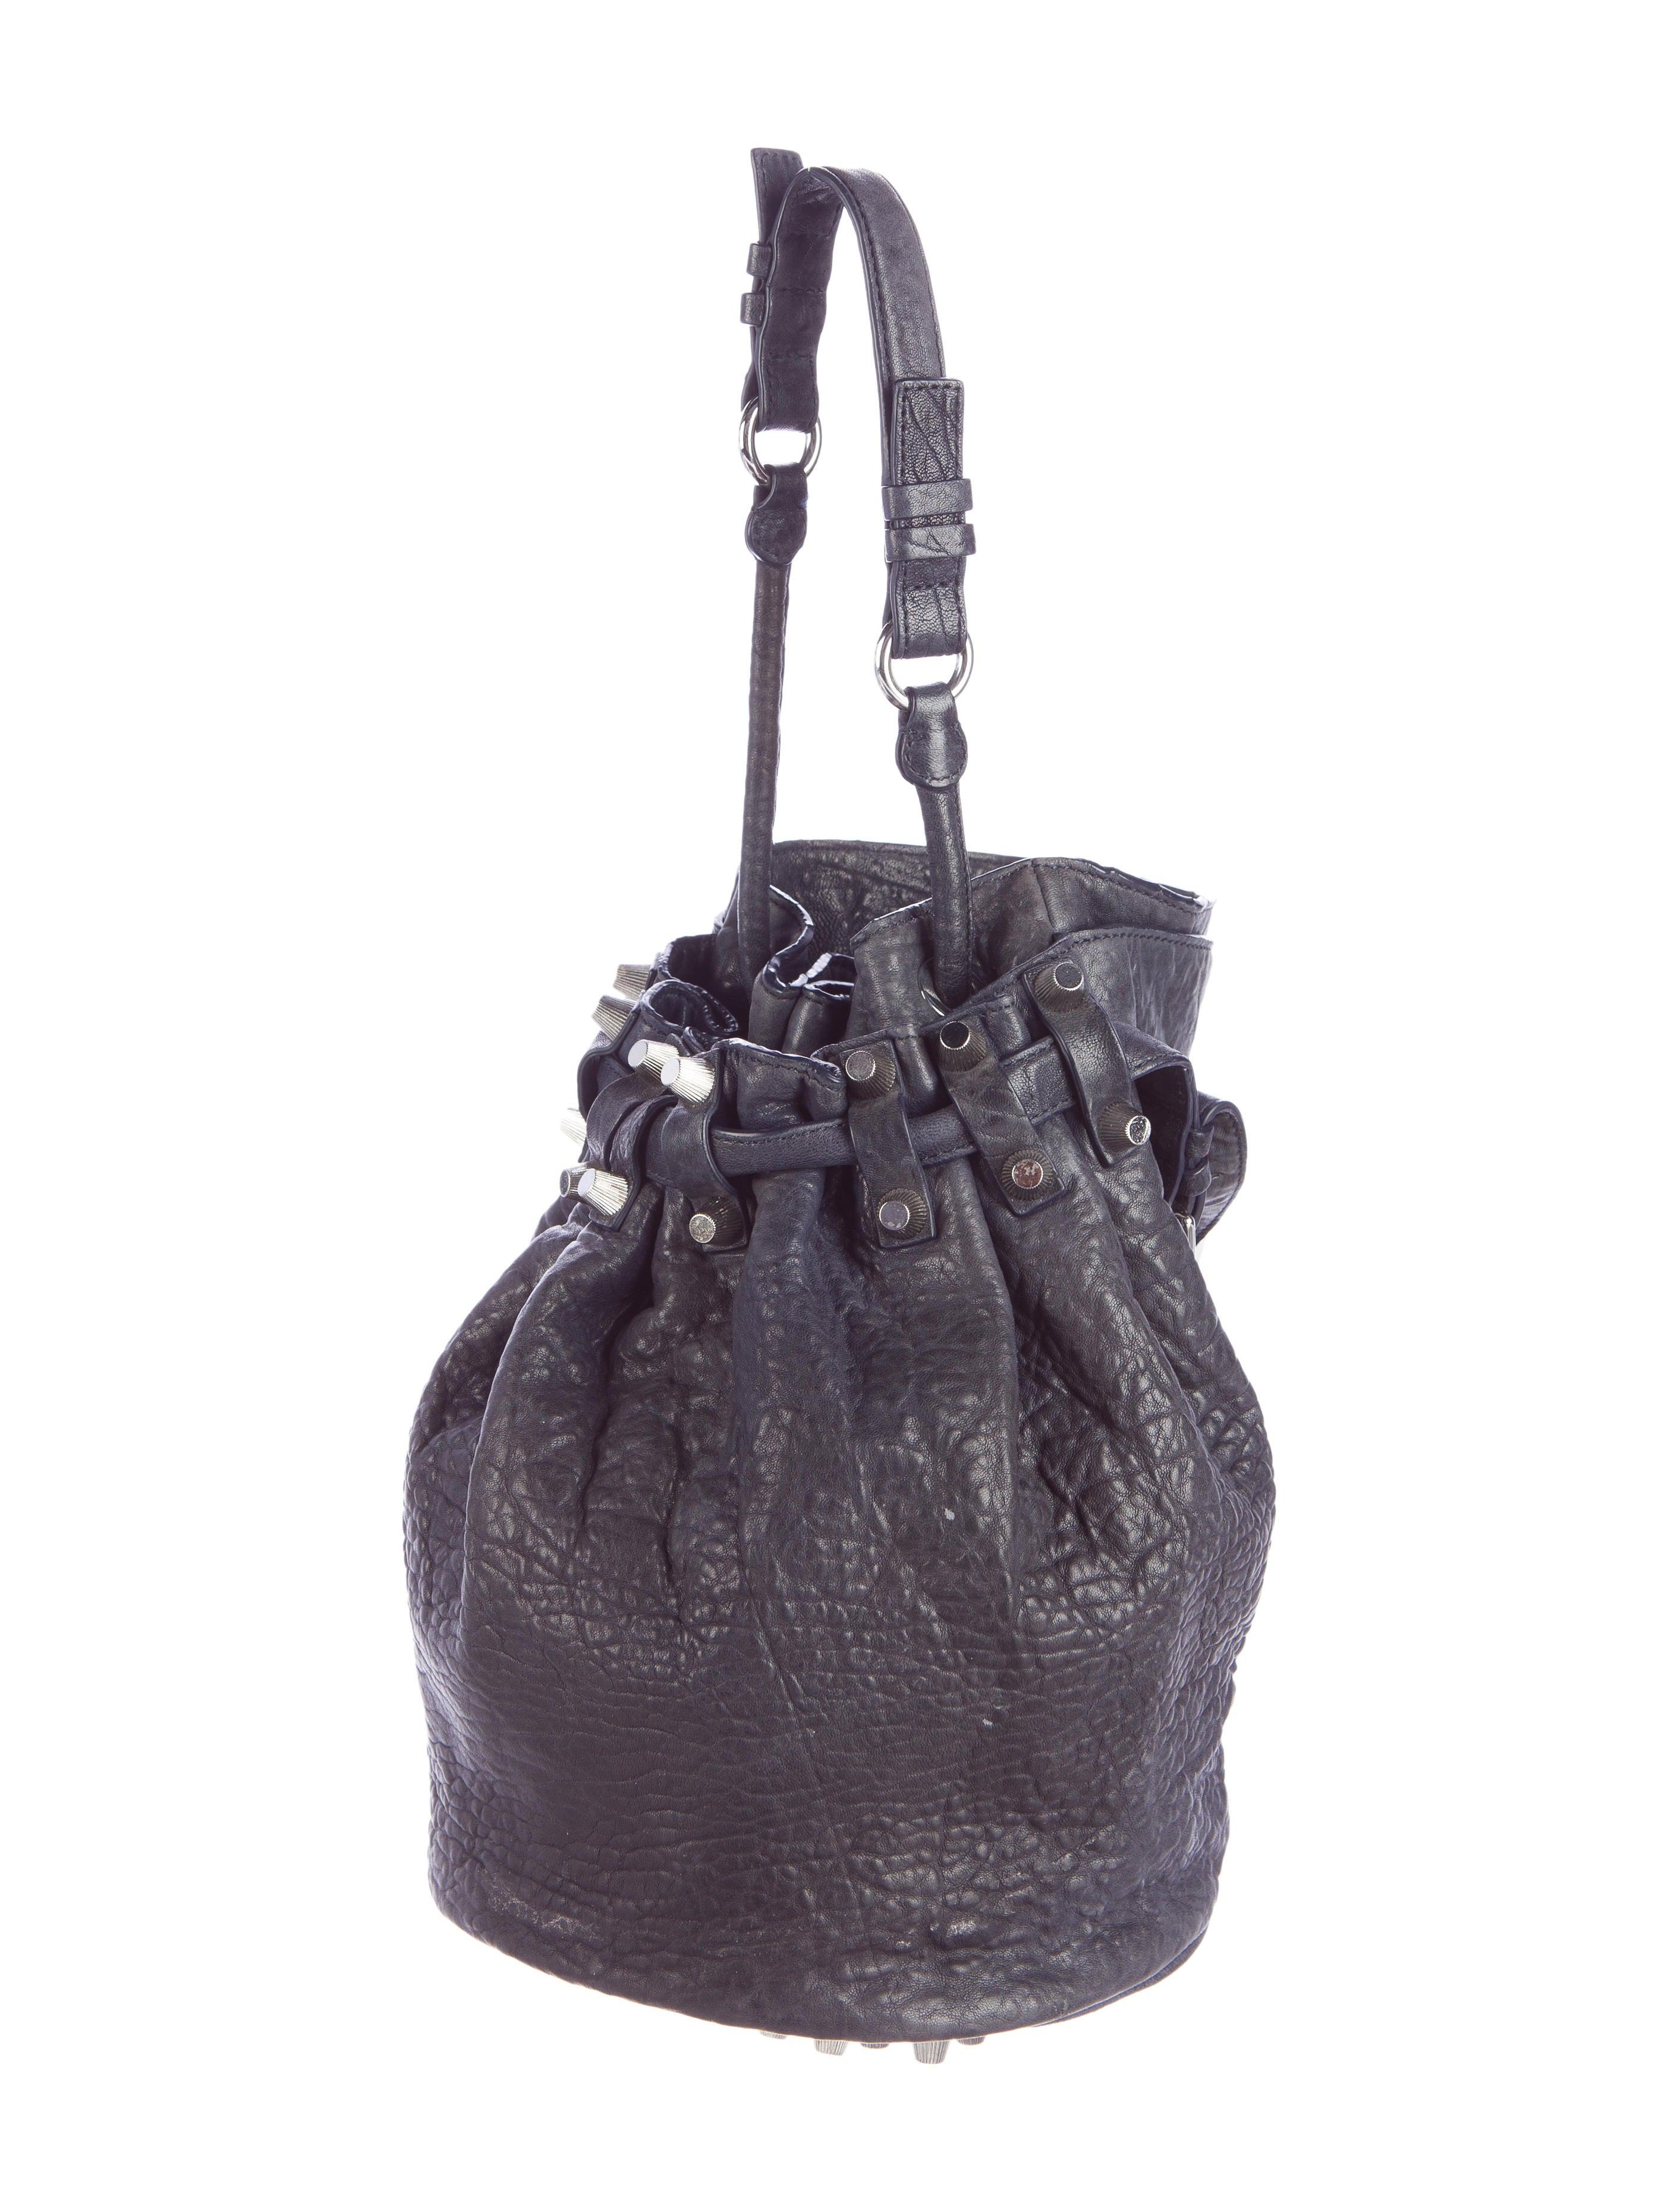 Favorite Micro Marti Bag. Alexander Wang. Micro Marti Bag. $ Favorite Deconstructed Tank Dress. Alexander Wang. Deconstructed Tank Dress. $1, $1, Favorite 5 Pocket Zip Skirt. Alexander Wang. Sleeve Tie Skort. $ New. Please Sign In. Please sign in .